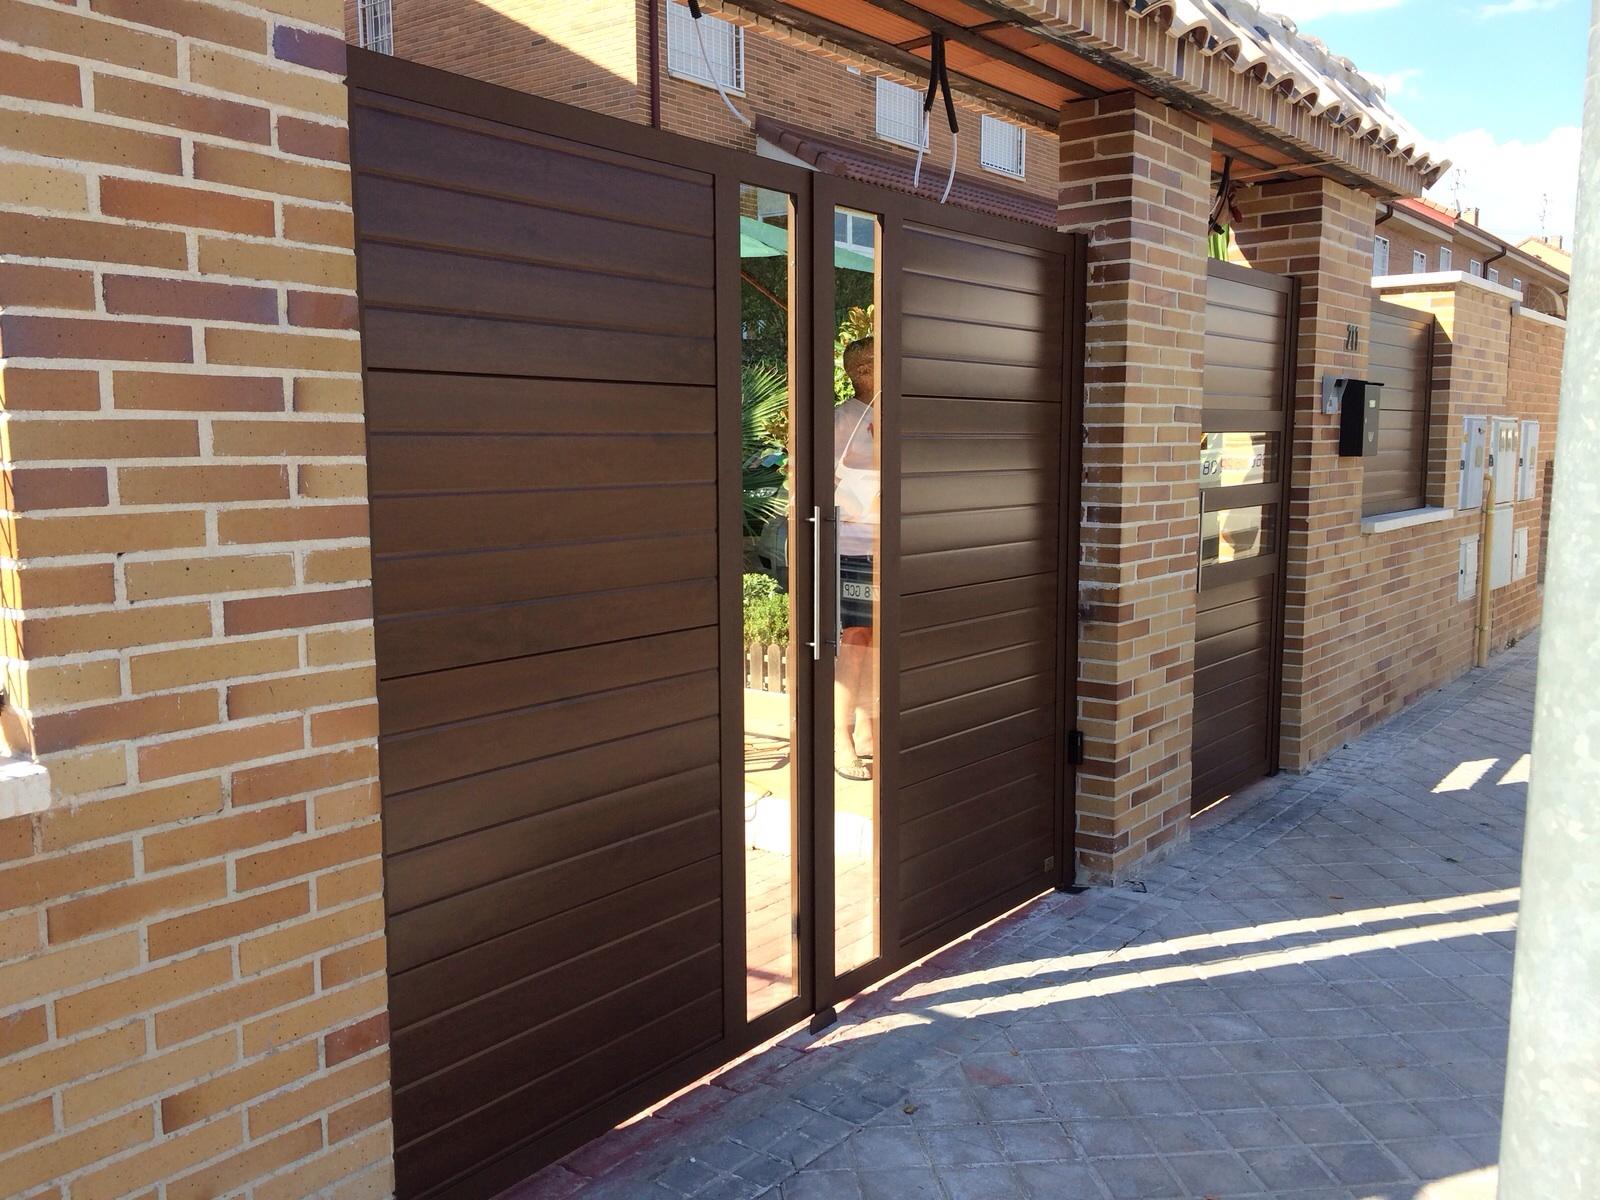 Puertas de aluminio exterior imitacion madera awesome aluminio acabado madera cerezo with - Imitacion madera exterior ...